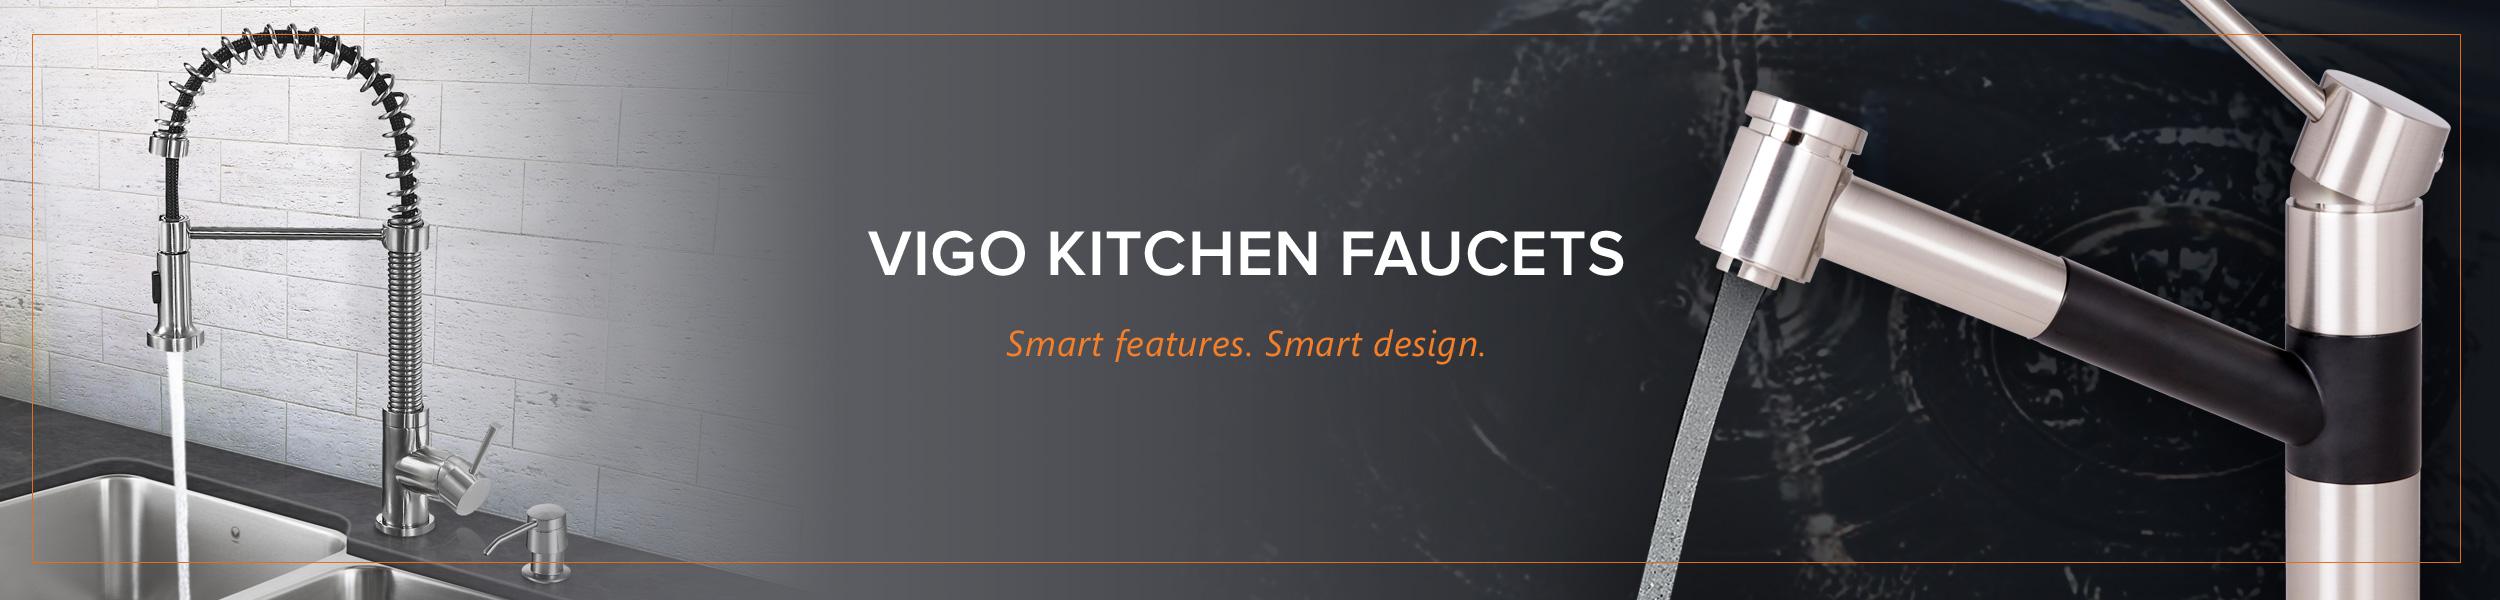 kitchen faucets kitchen faucets Kitchen Faucets